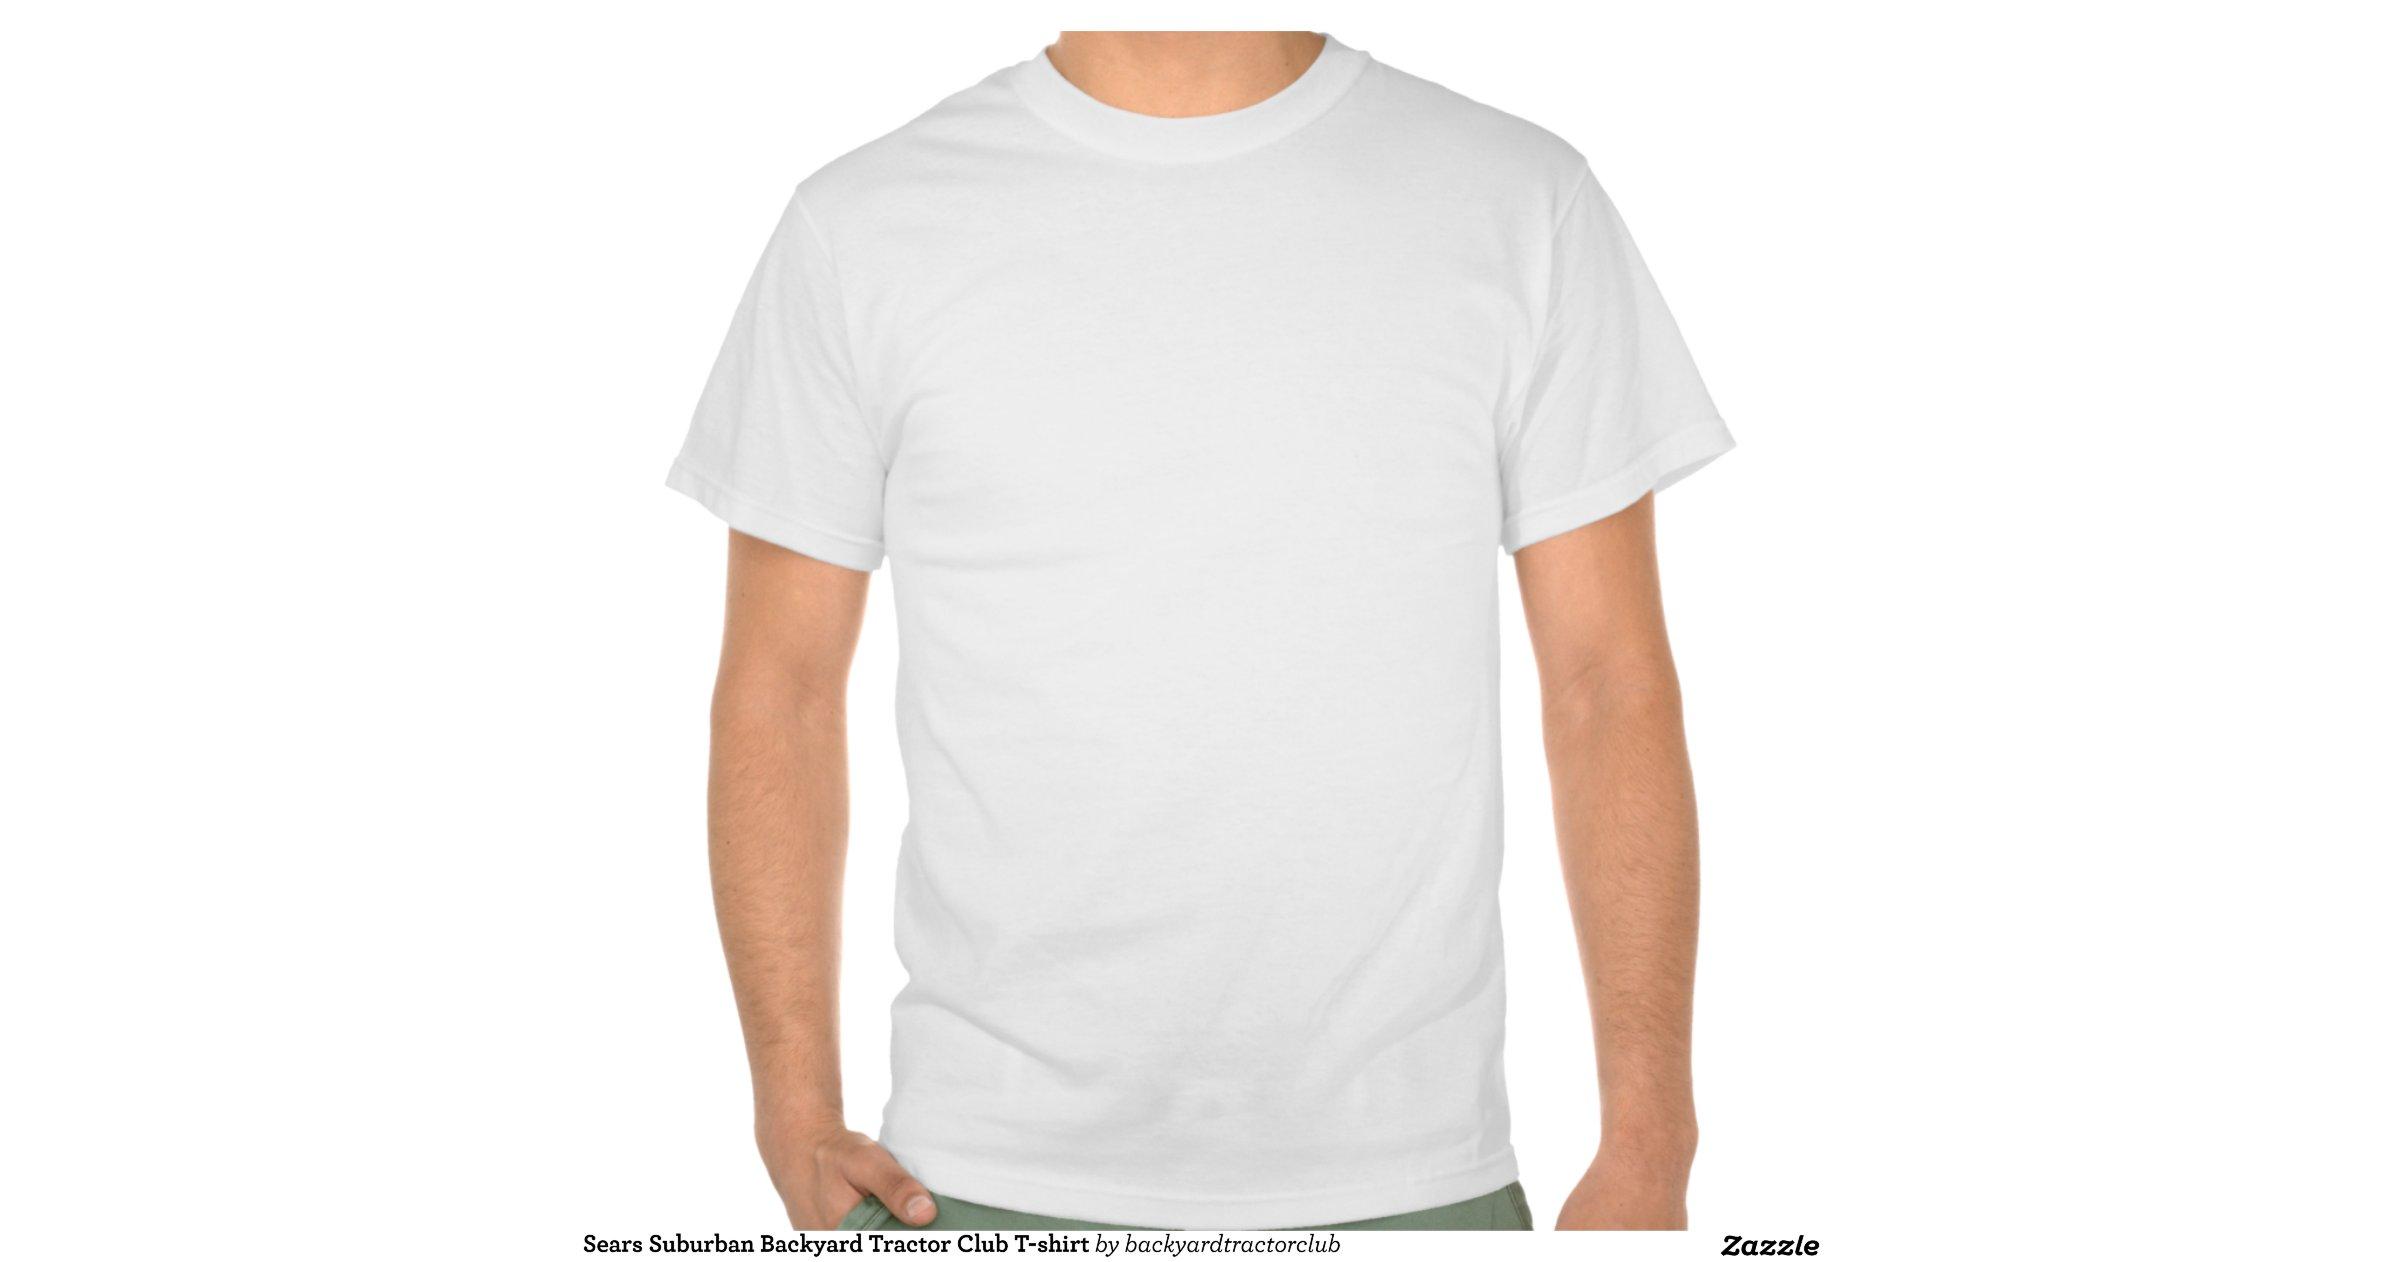 Sears Suburban Backyard Tractor Club T Shirt